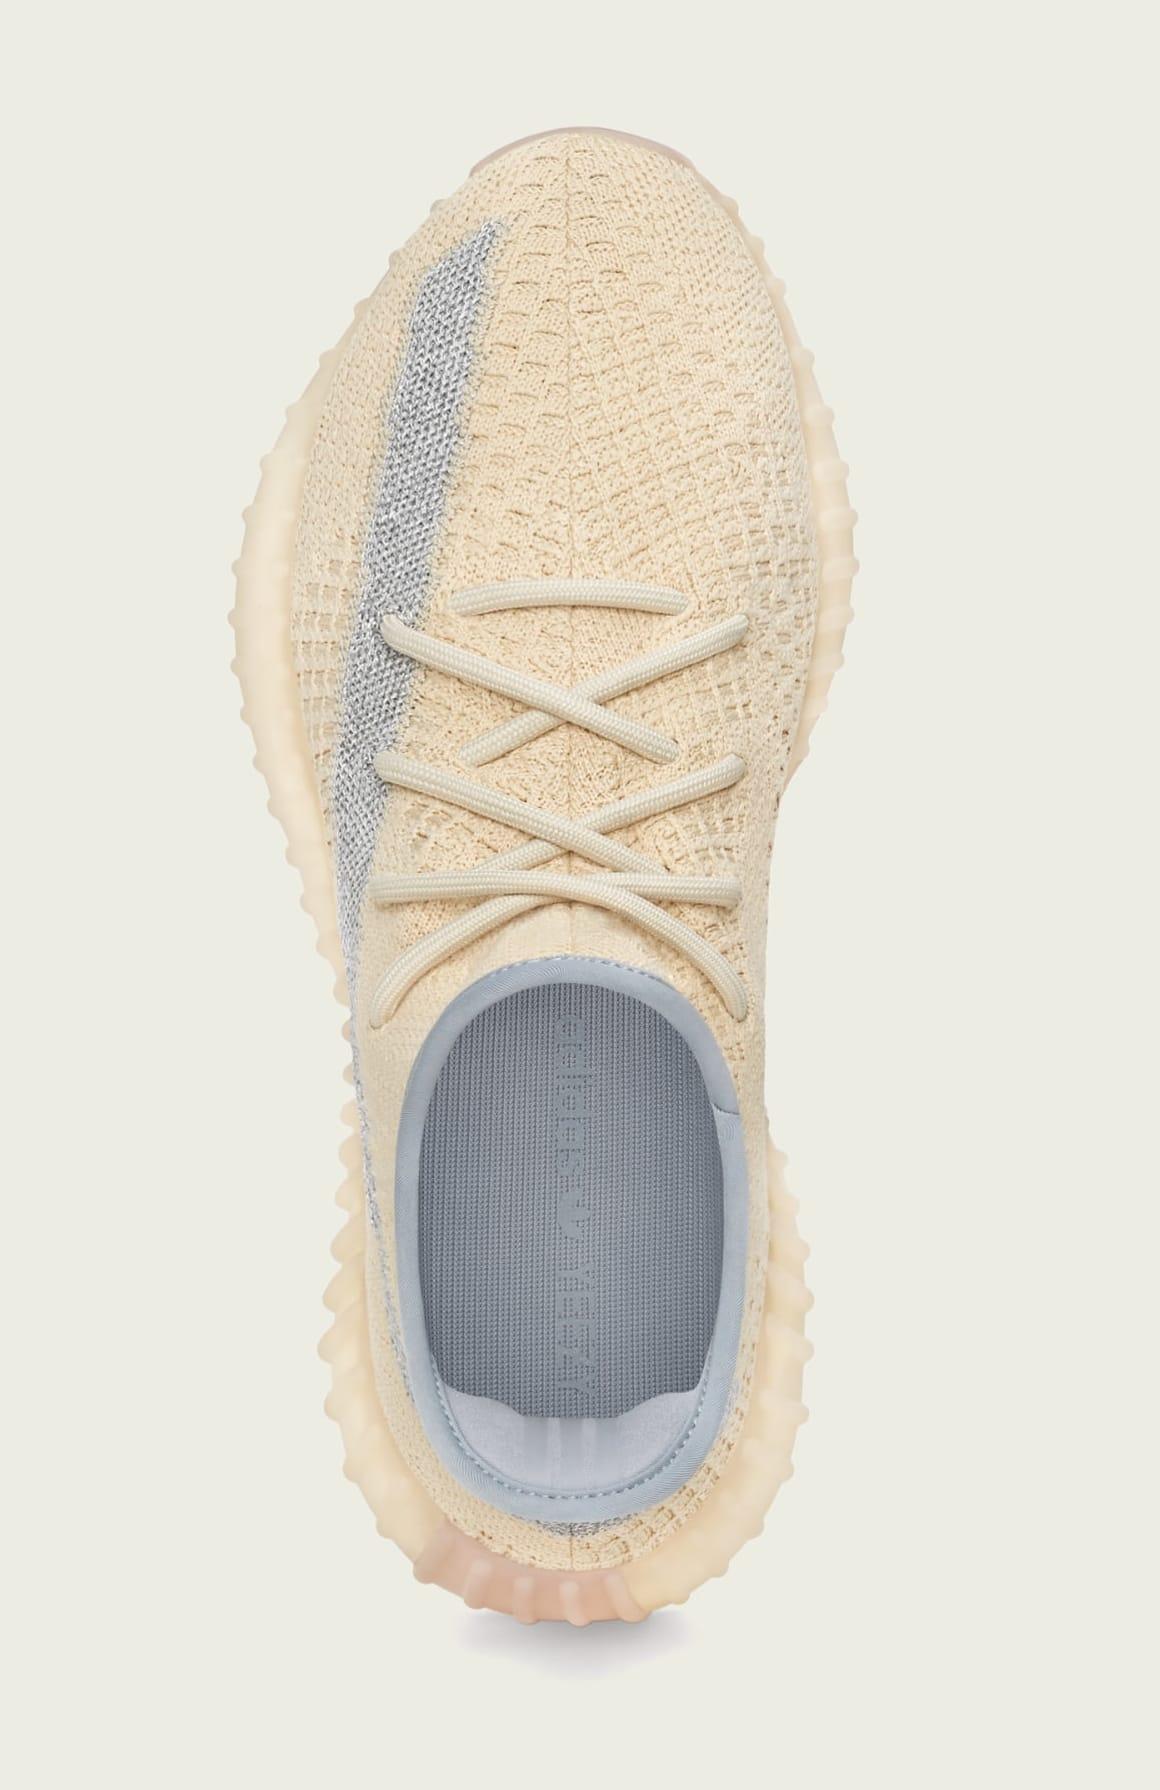 Adidas Yeezy Boost 350 V2 'Linen' FY5158 Top